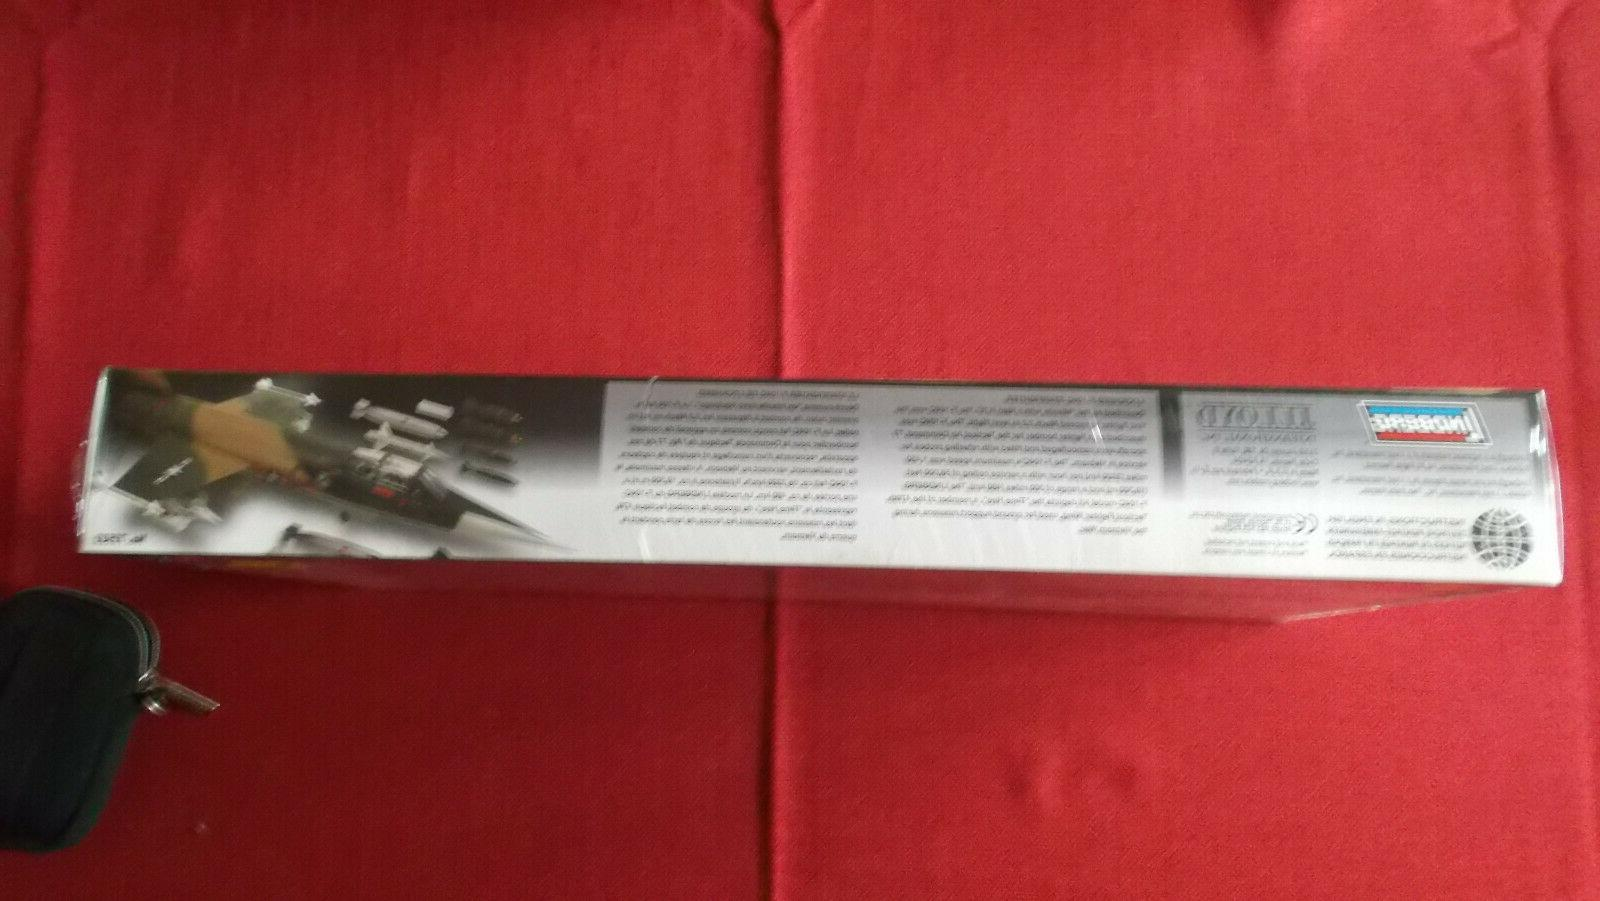 LINDBERG FIREPOWER STARFIGHTER 1/48 SCALE MODEL KIT